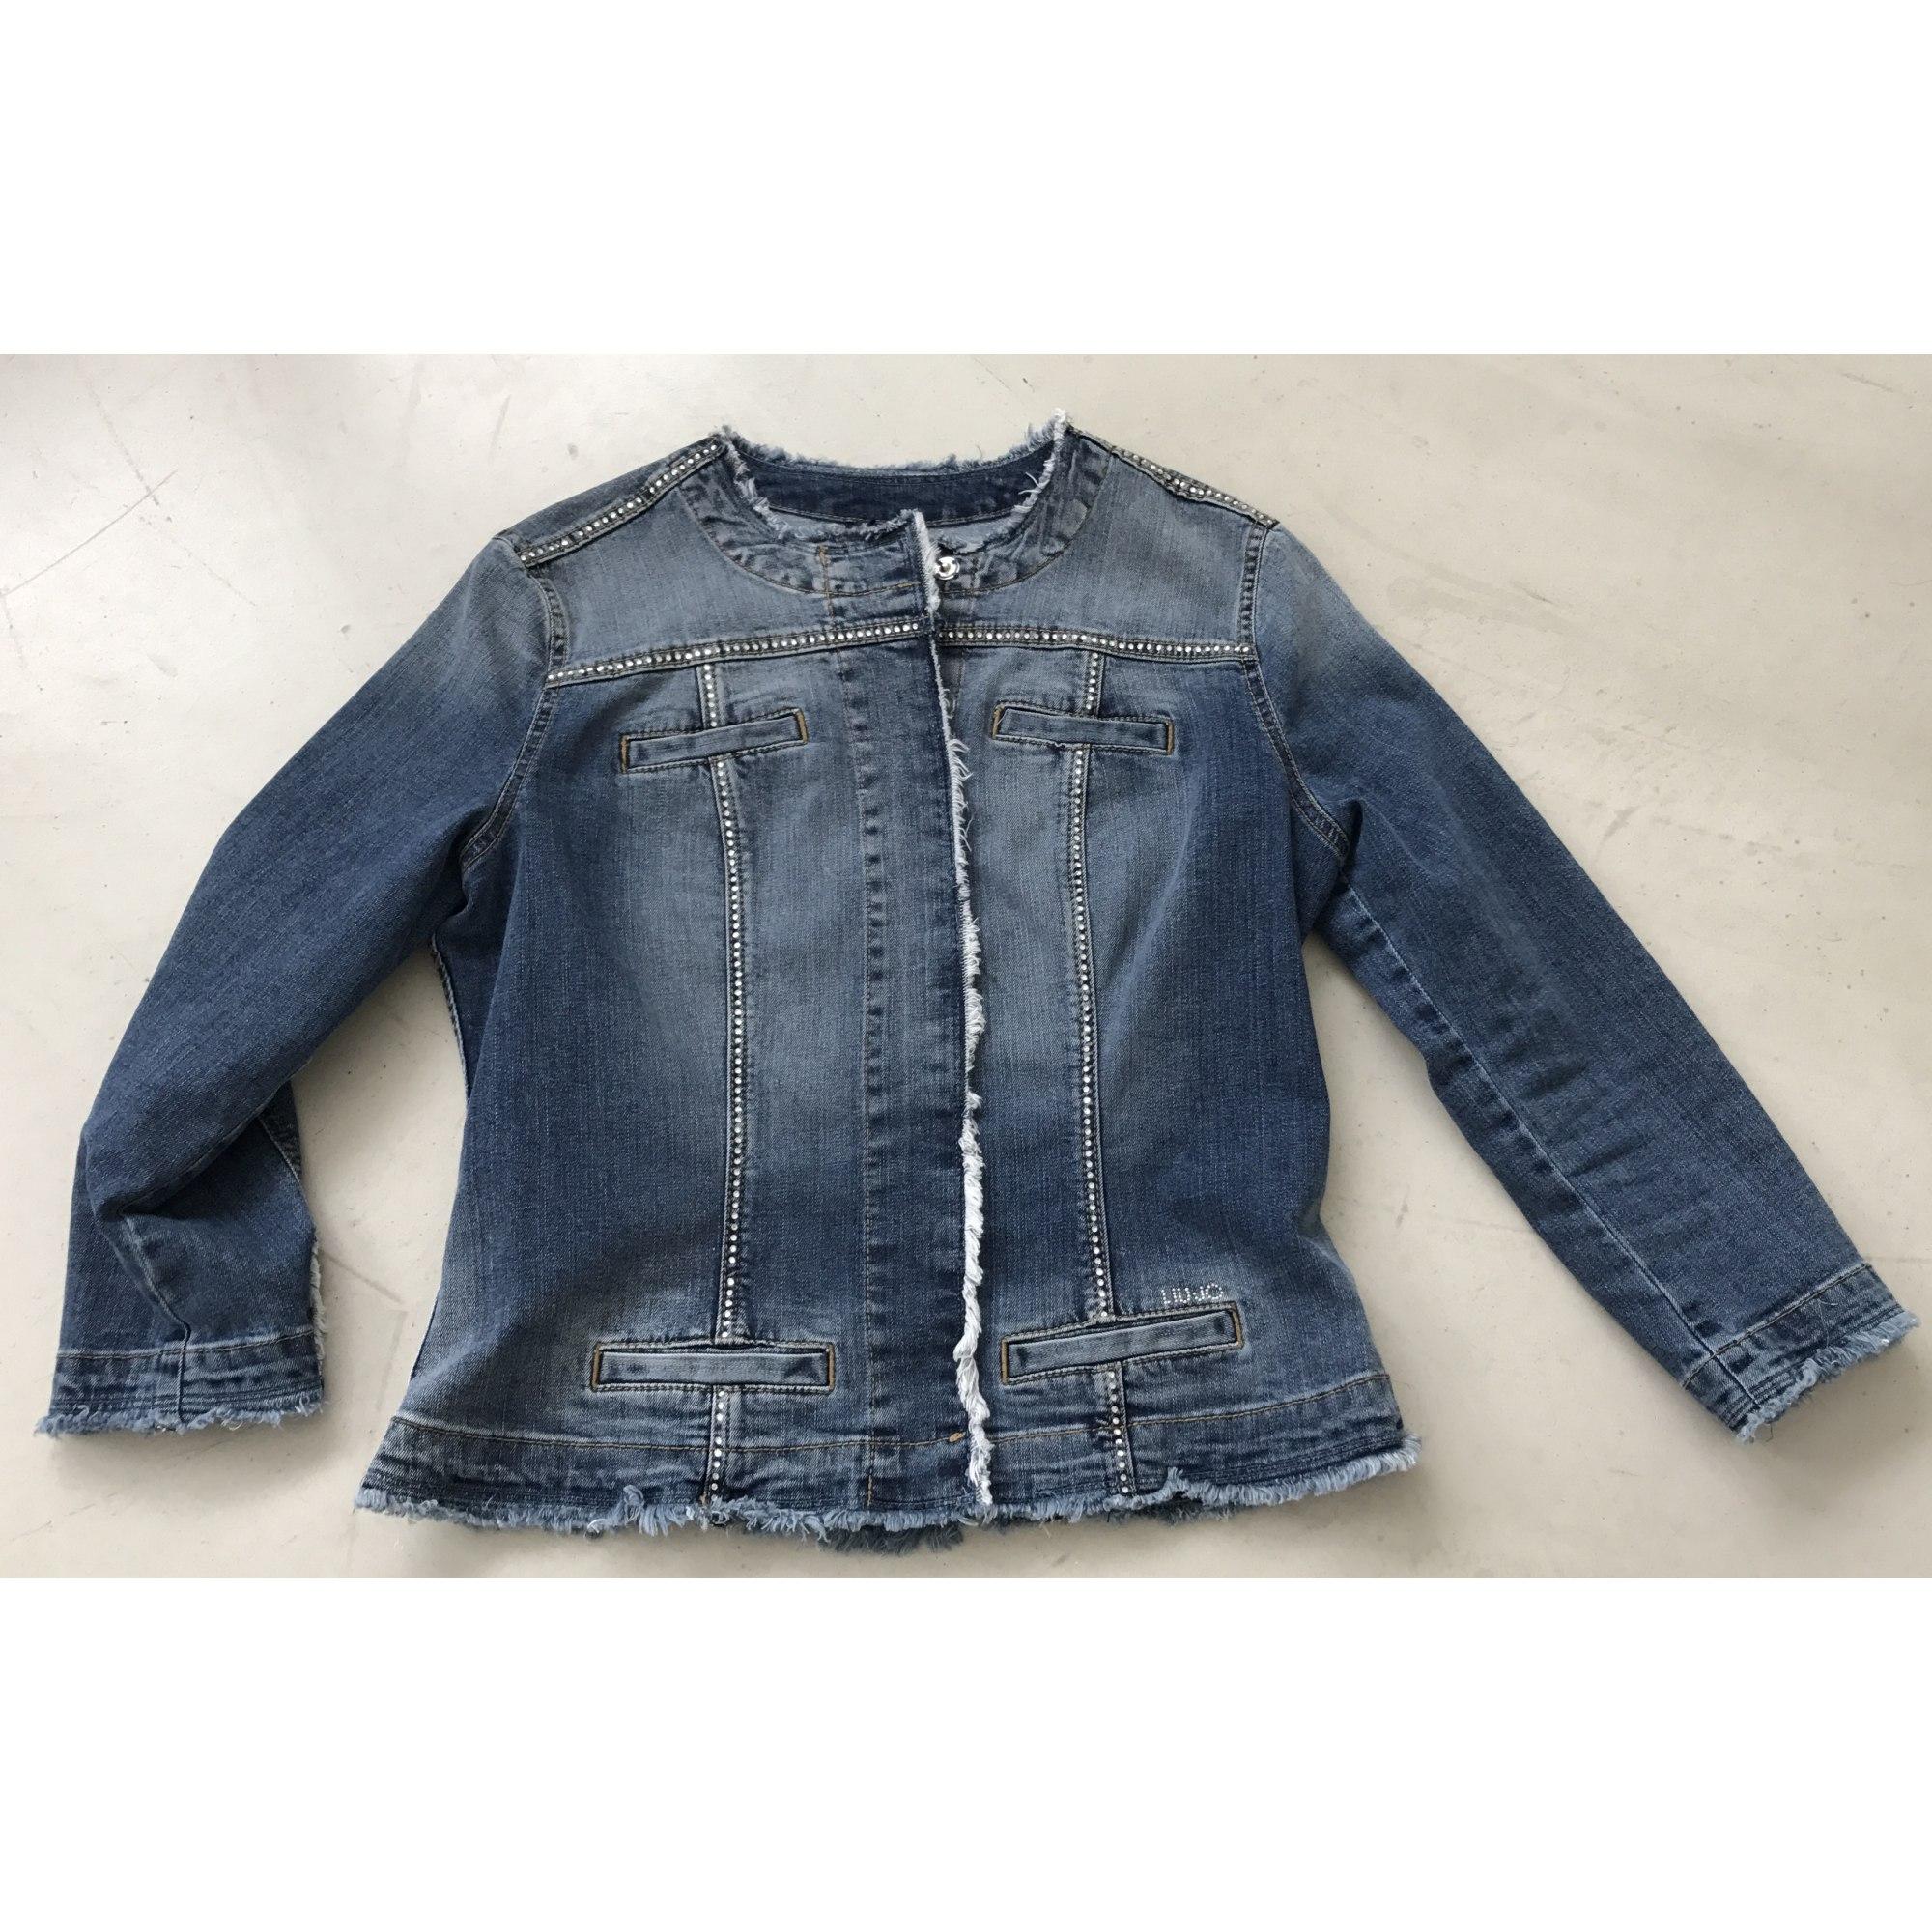 Veste en jean LIU JO 44 (XL/XXL, T5) bleu